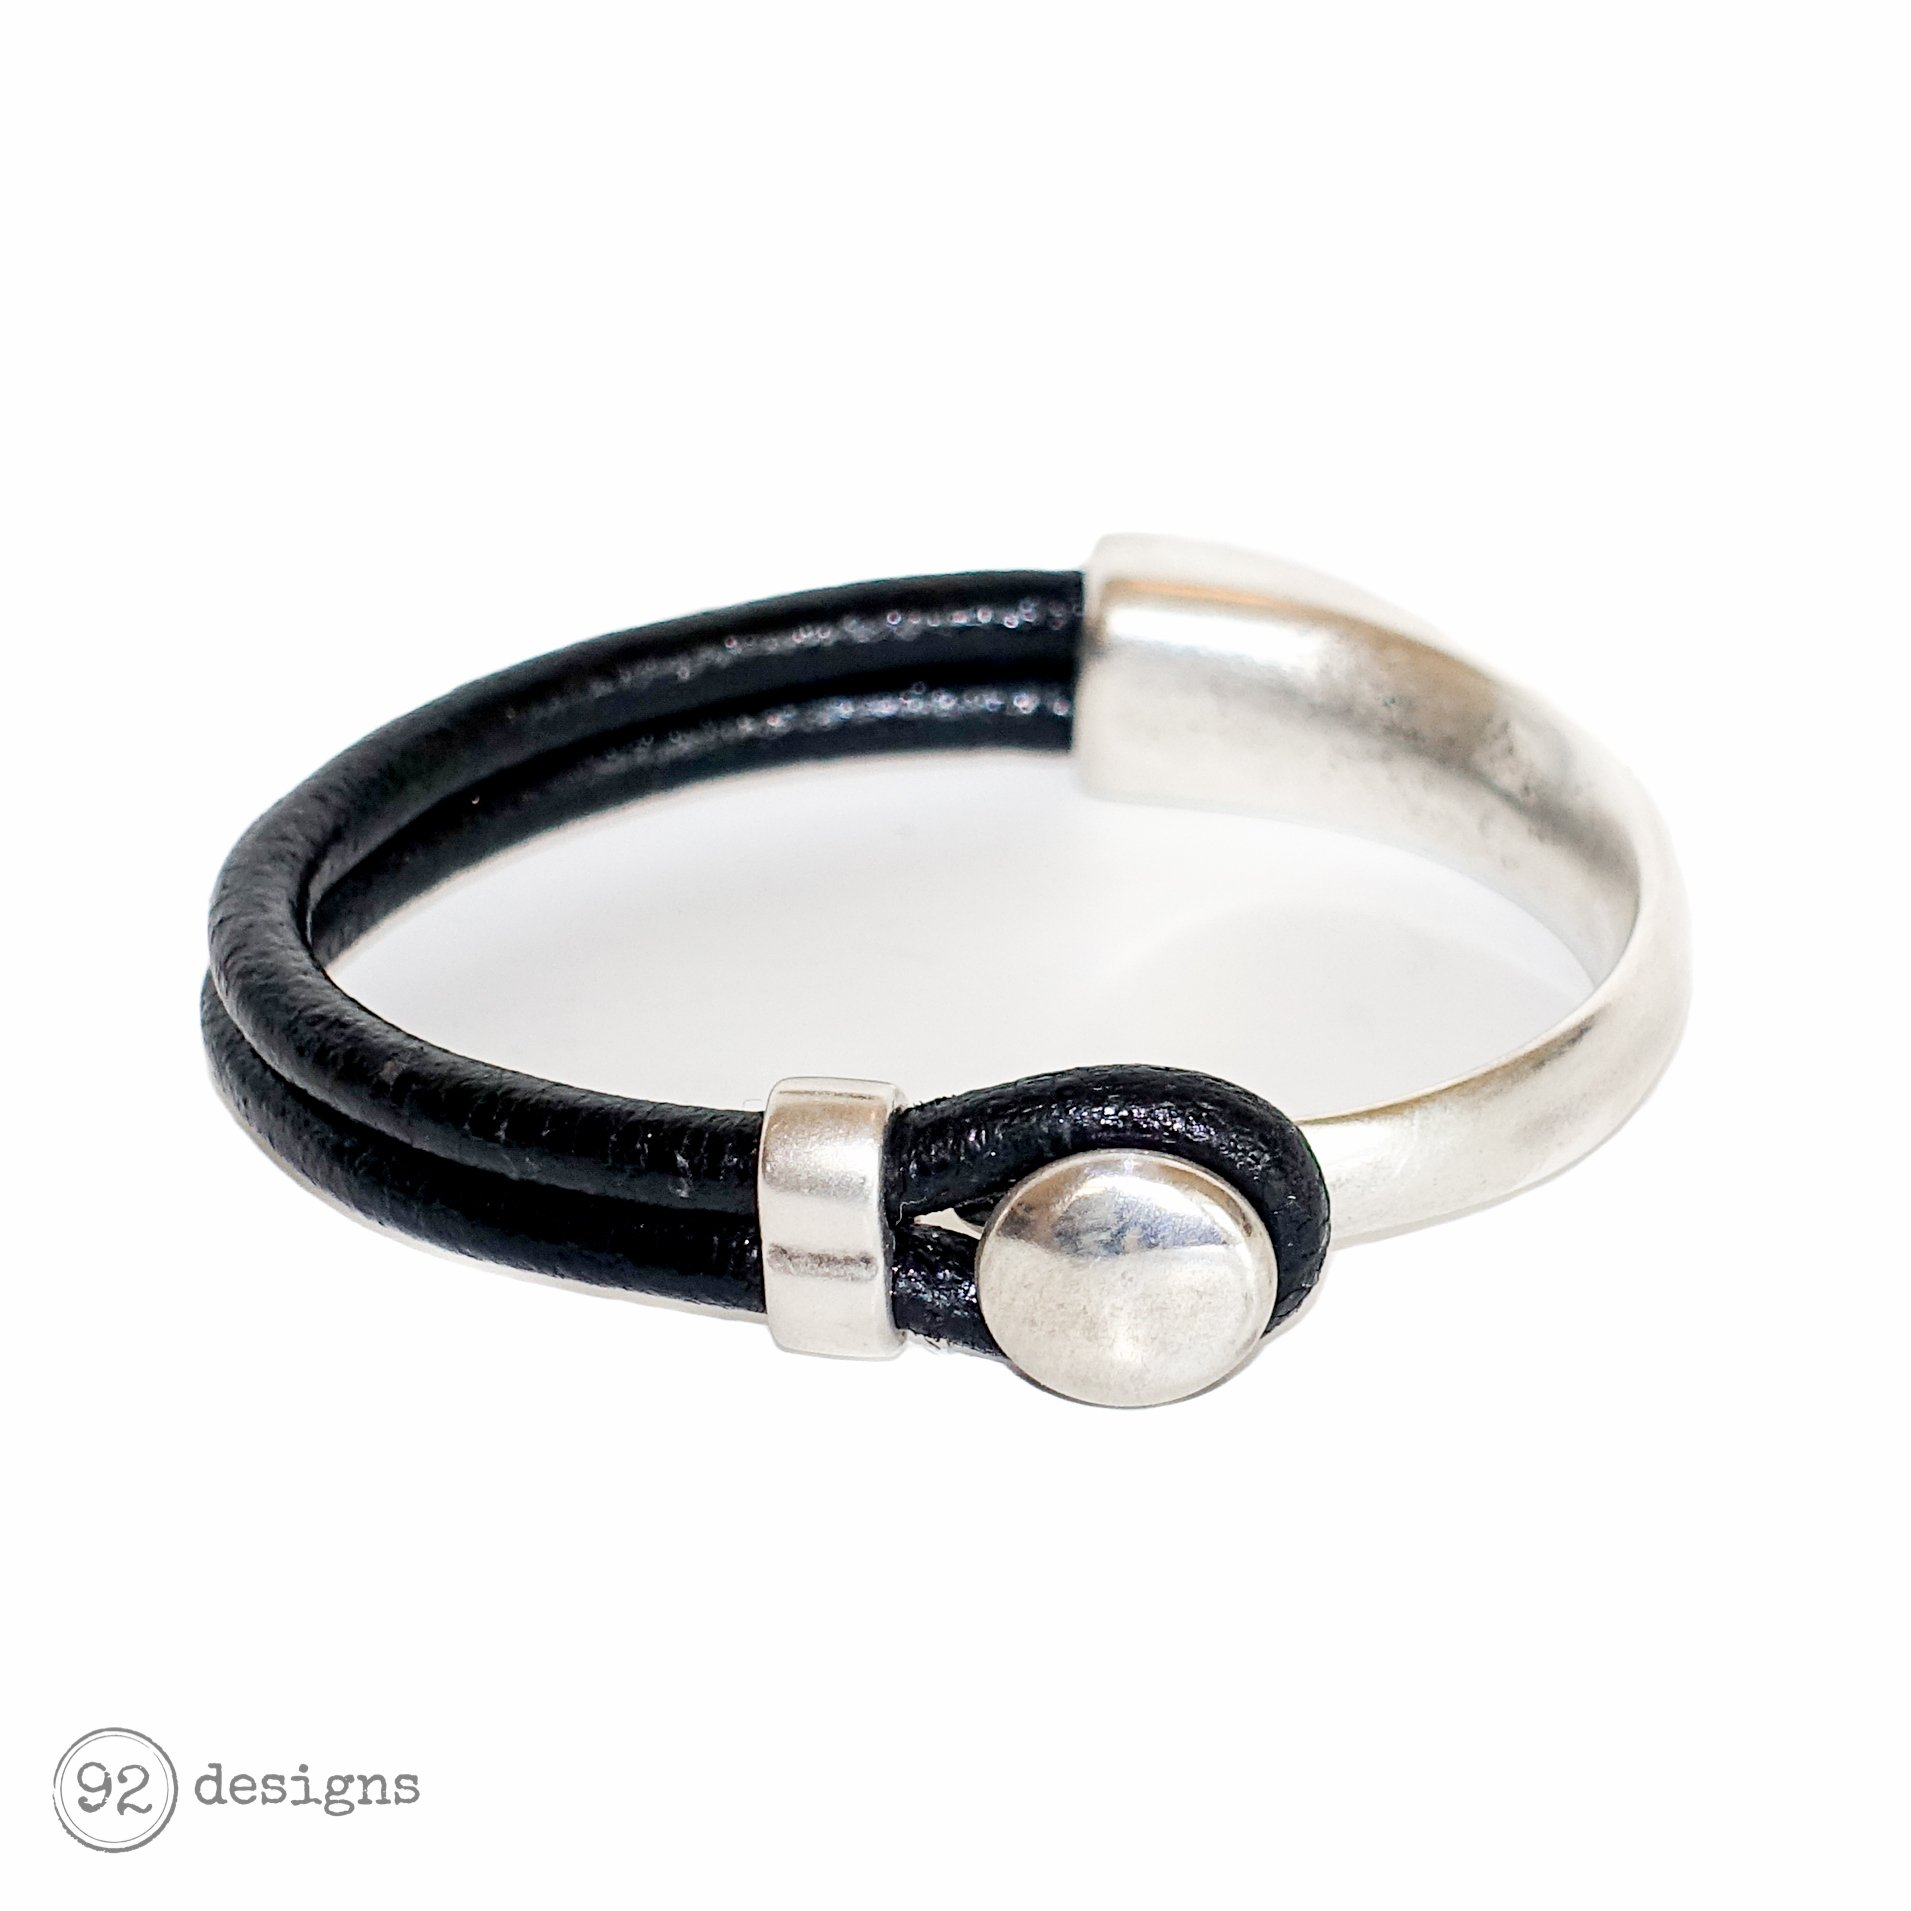 button top bracelet - silver/black